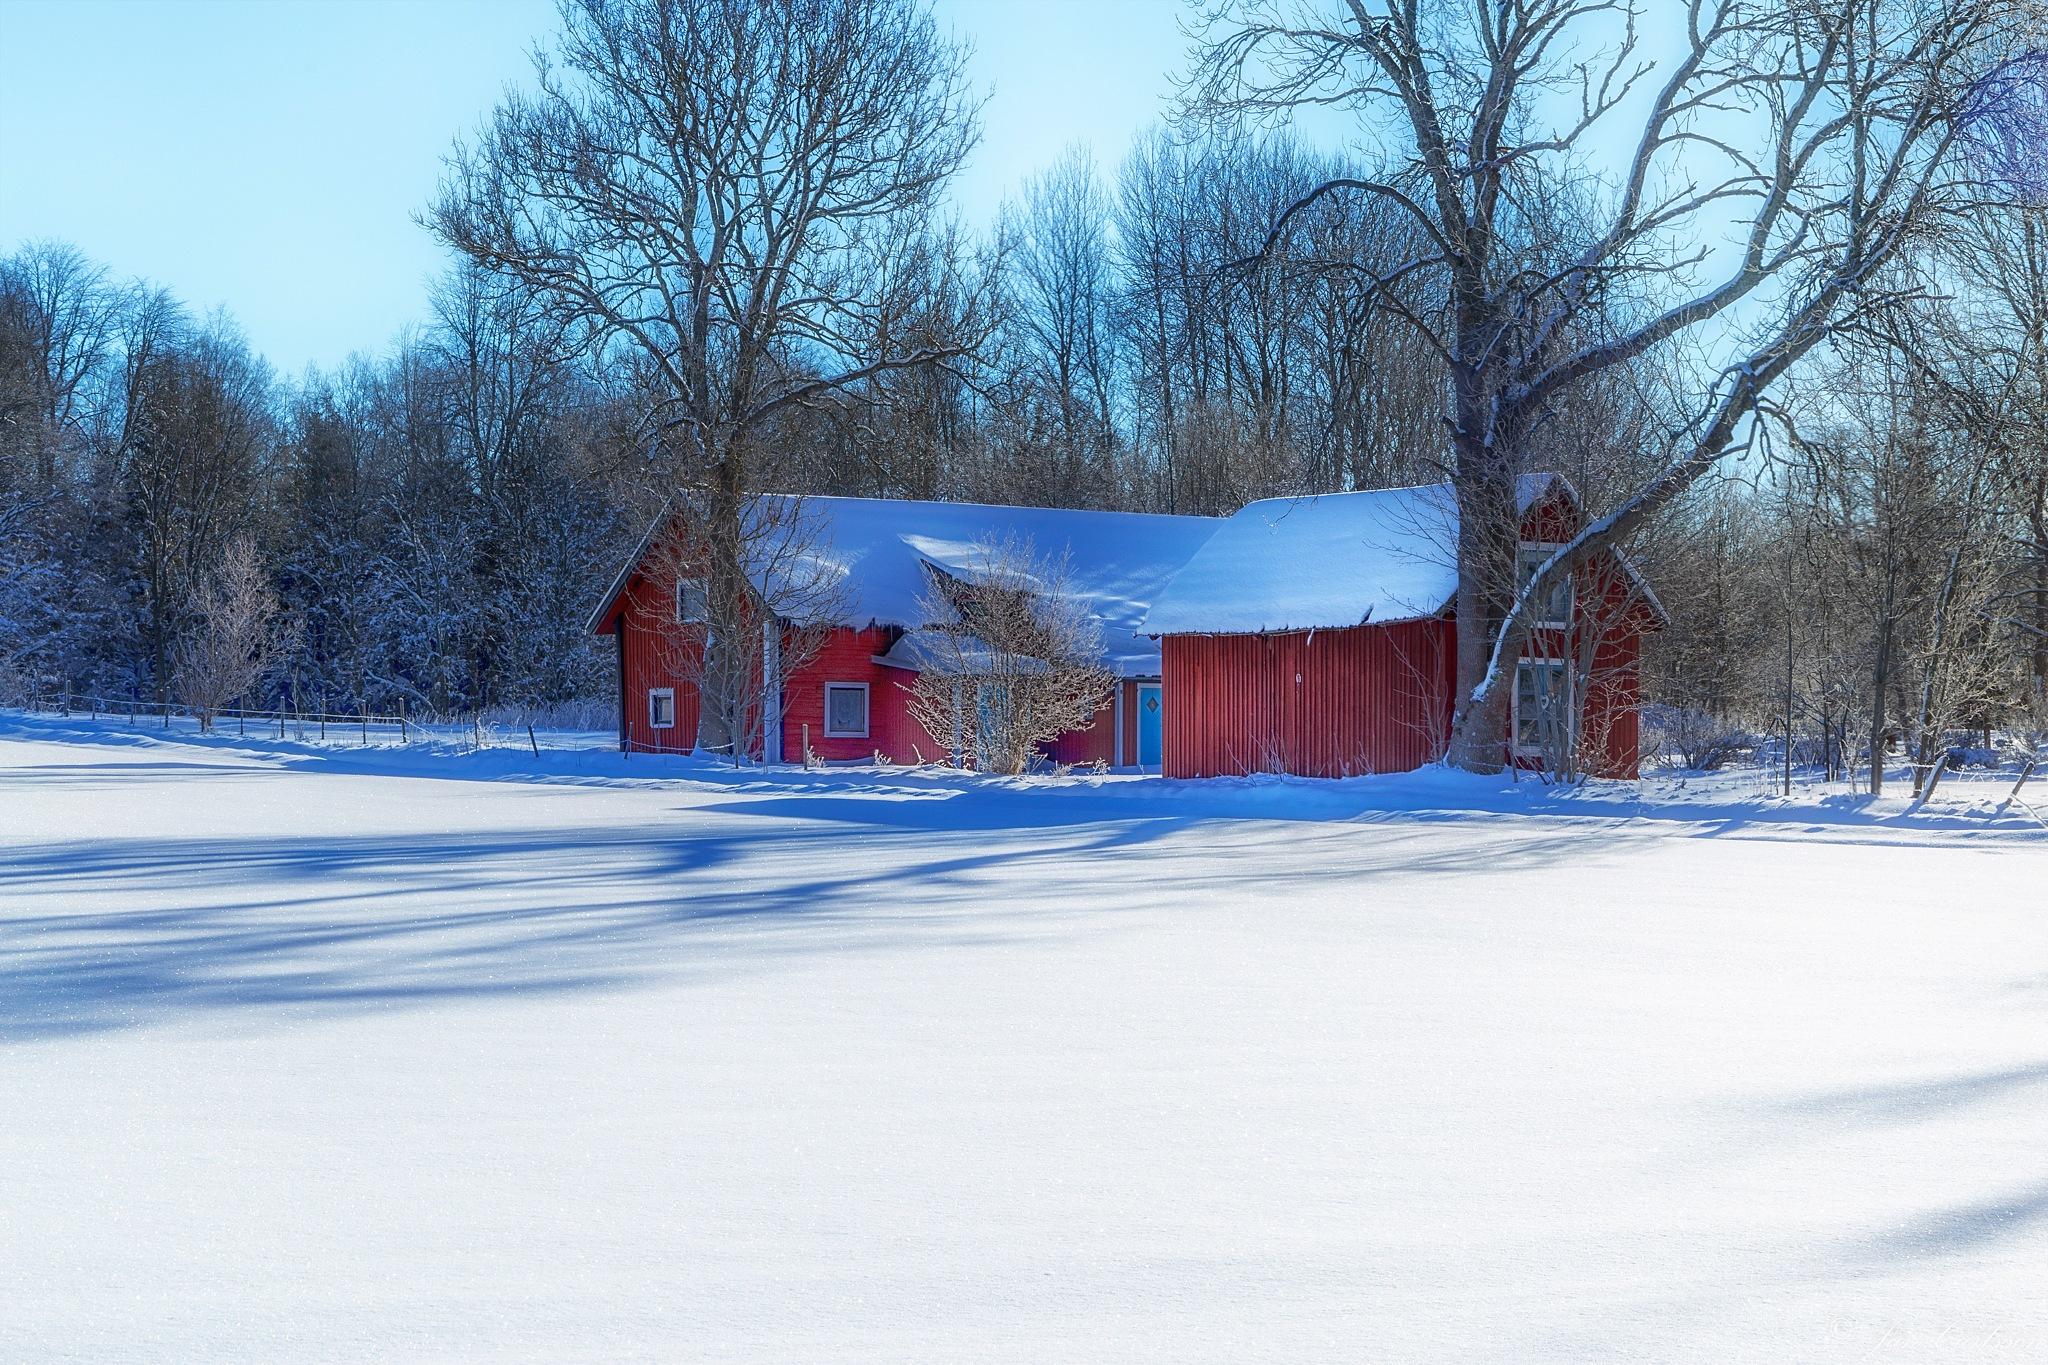 Winter - The Never Ending Story VIII by carljan w carlsson